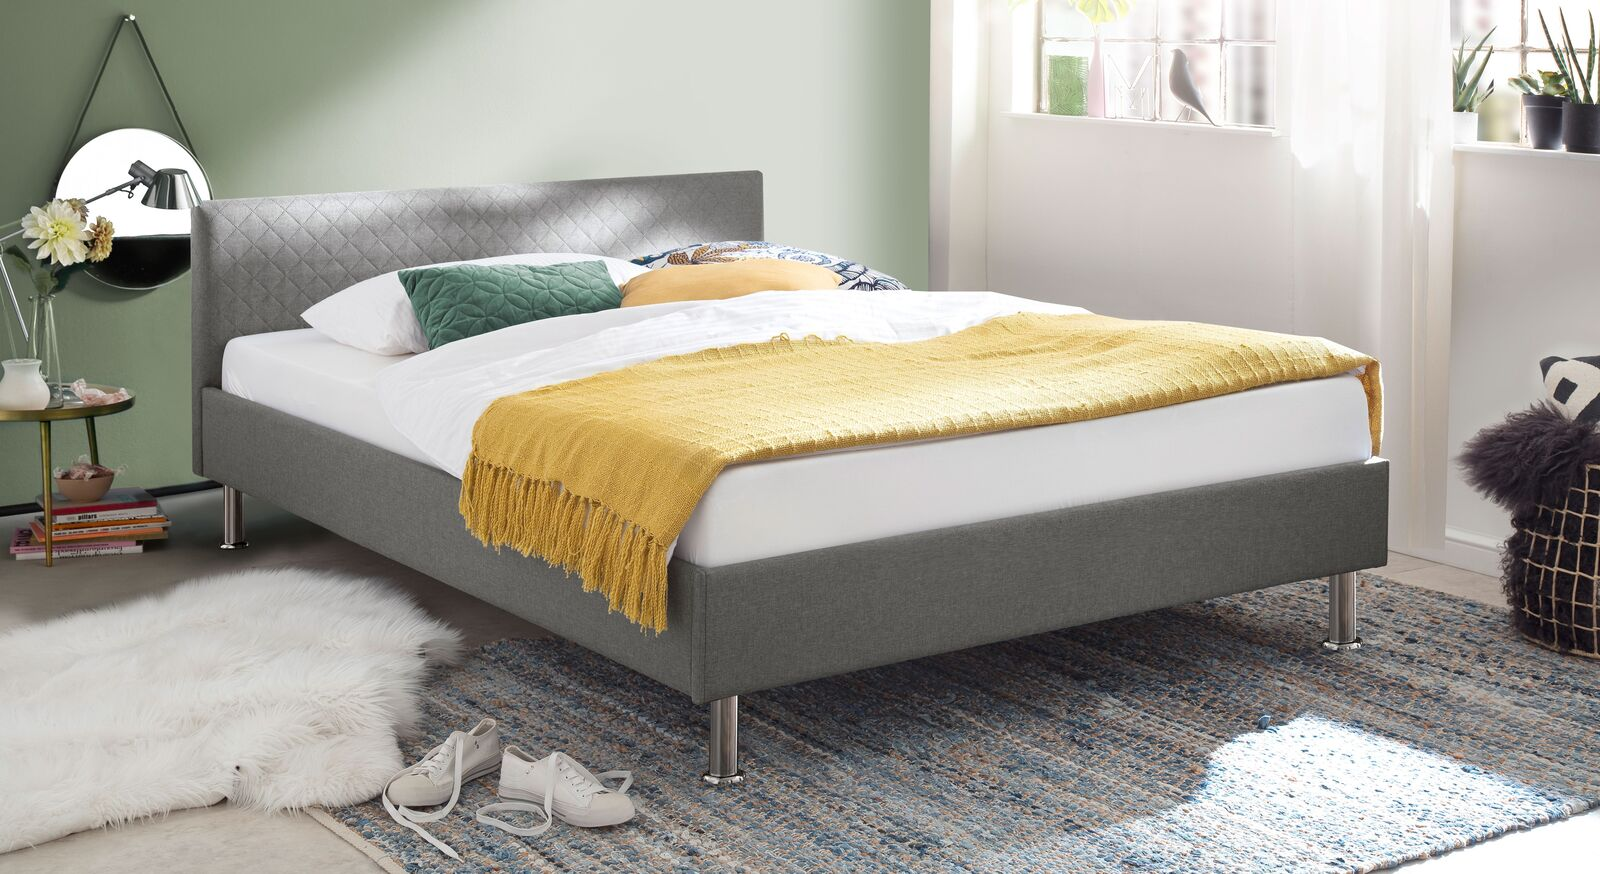 Bett Hime aus hellgrauem Webstoff